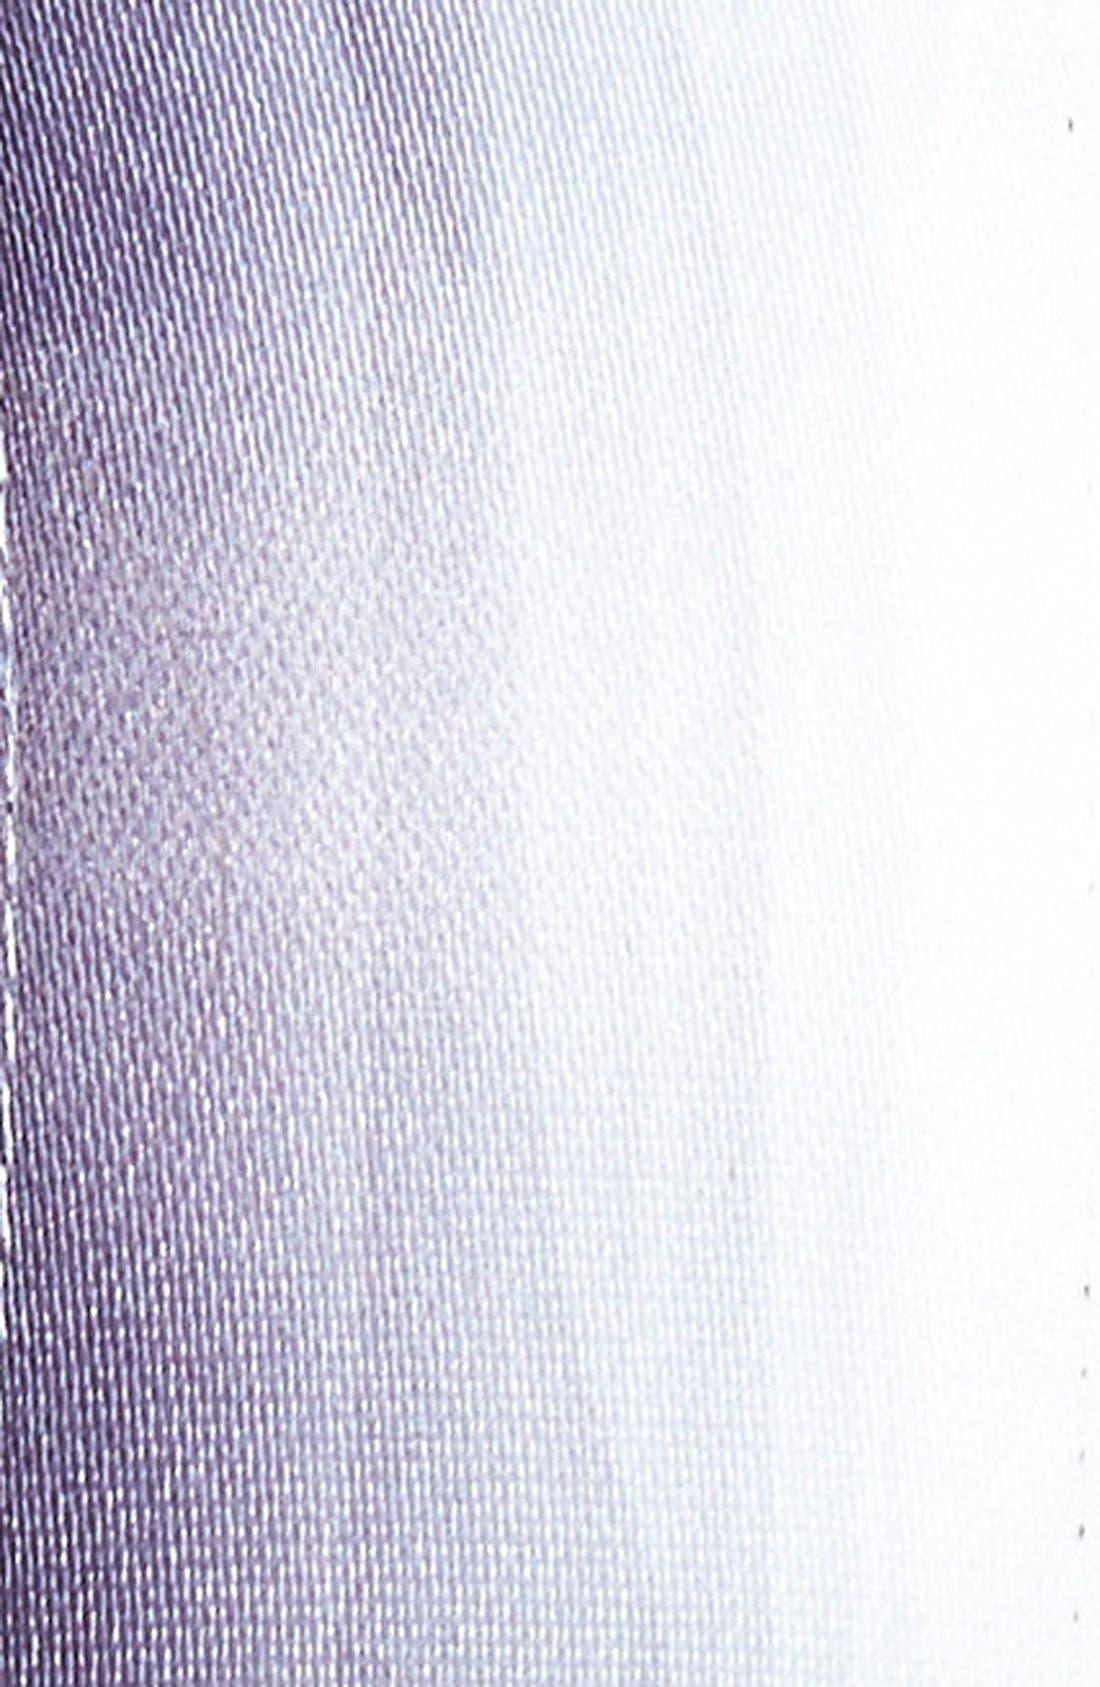 Alternate Image 2  - Sweaty Bands 'Watercolor' Head Wrap